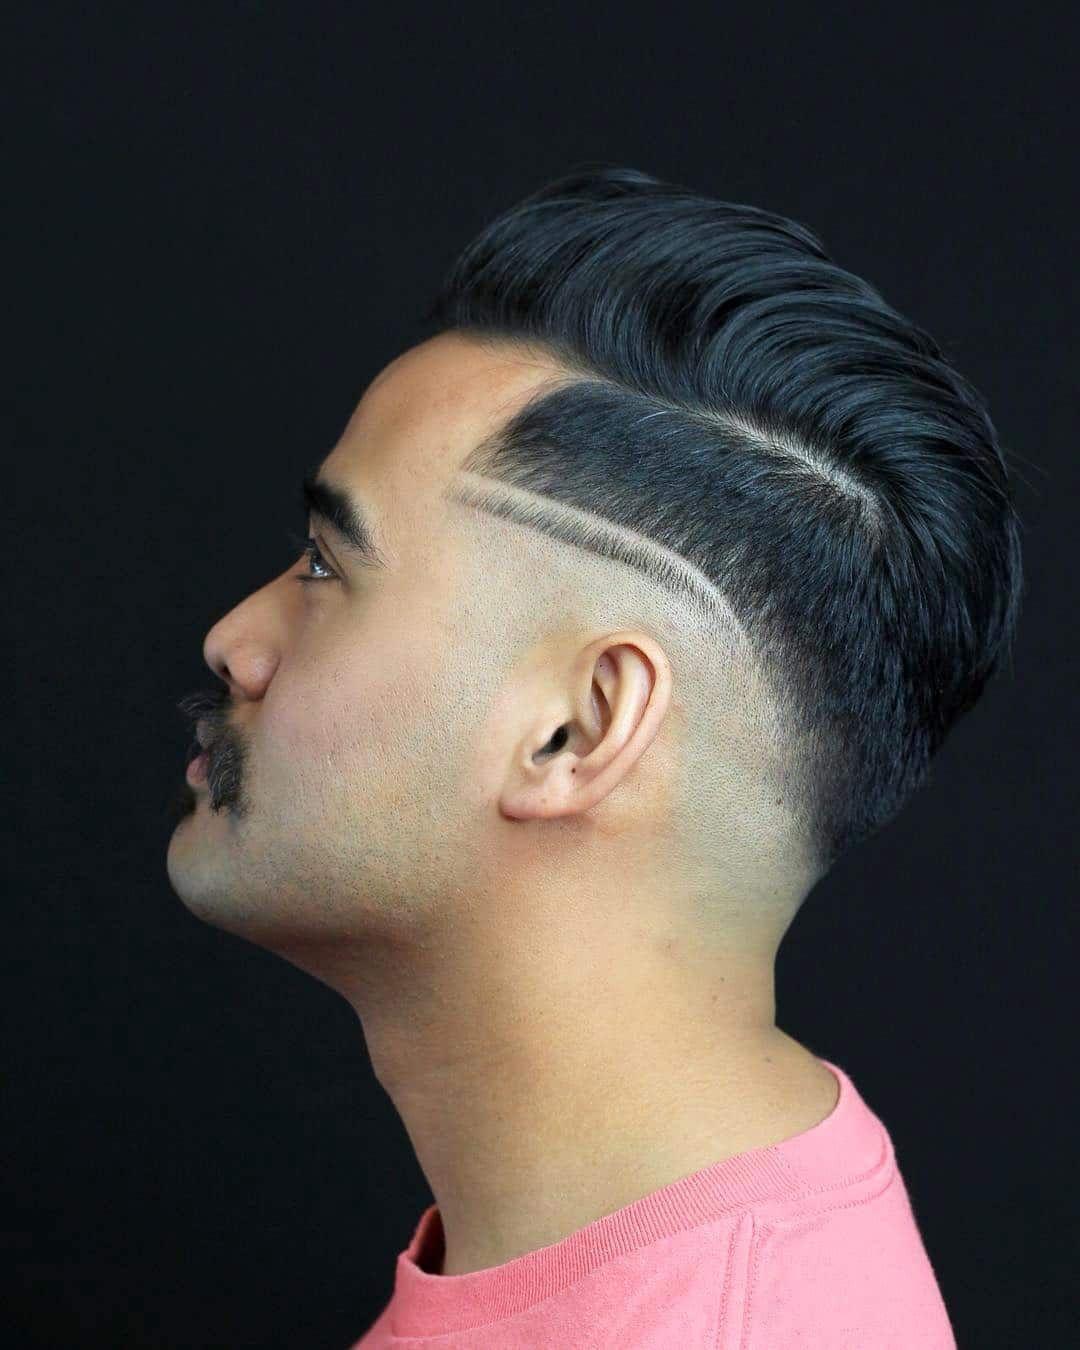 haircut designs: lines | hair designs: lines | hair cuts